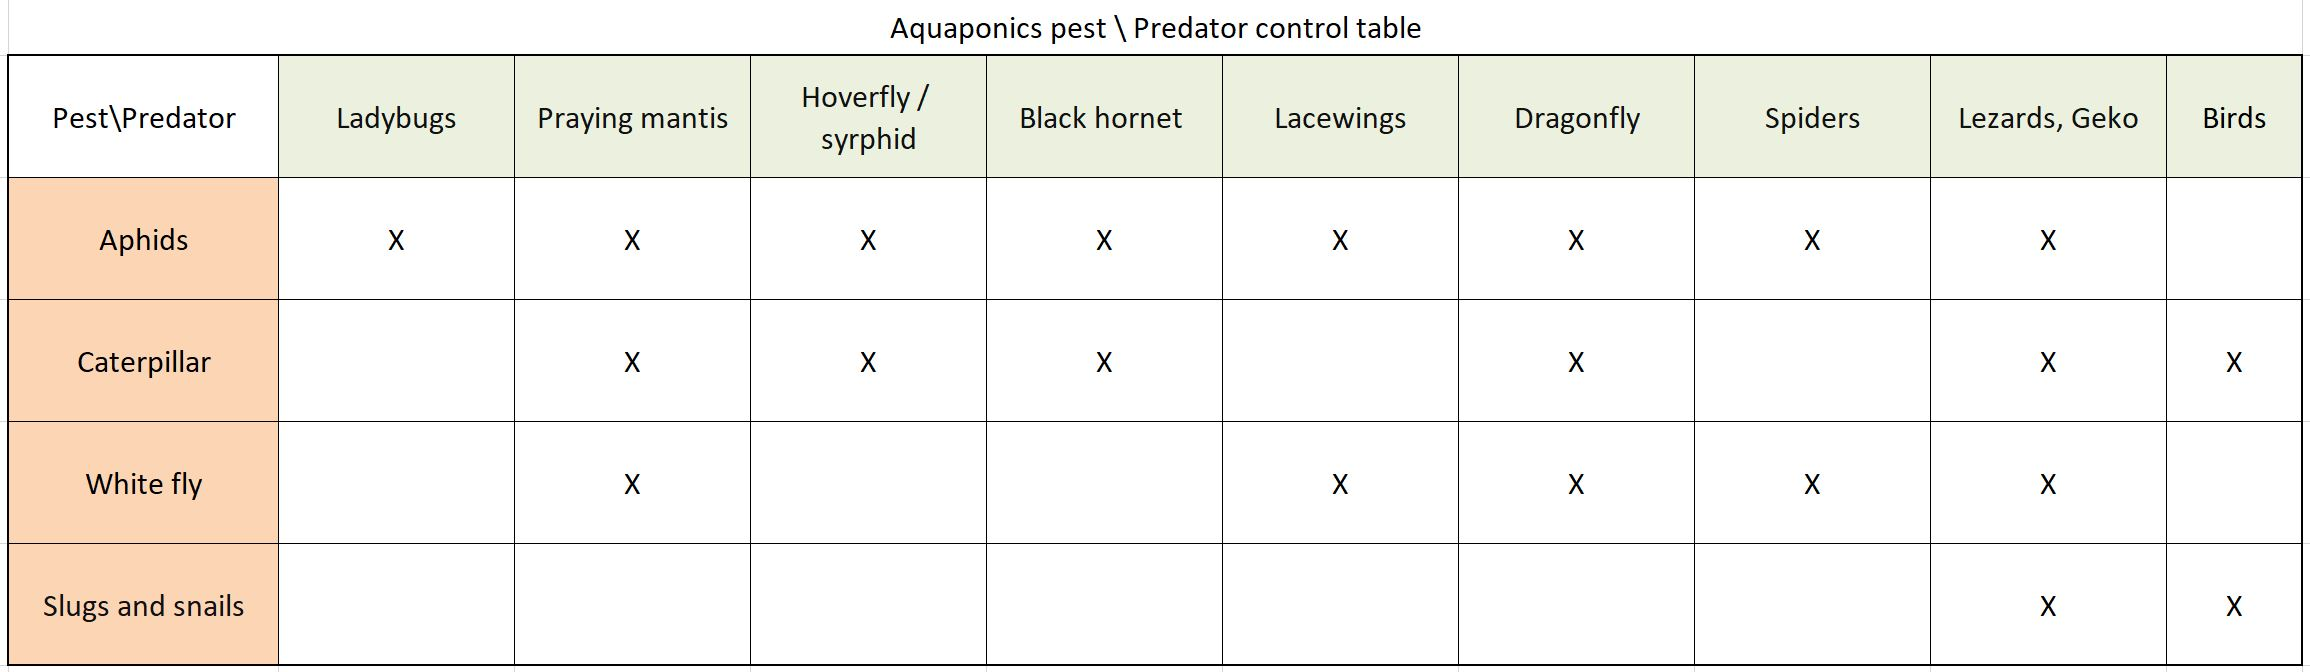 Pest - Predator table in aquaponics